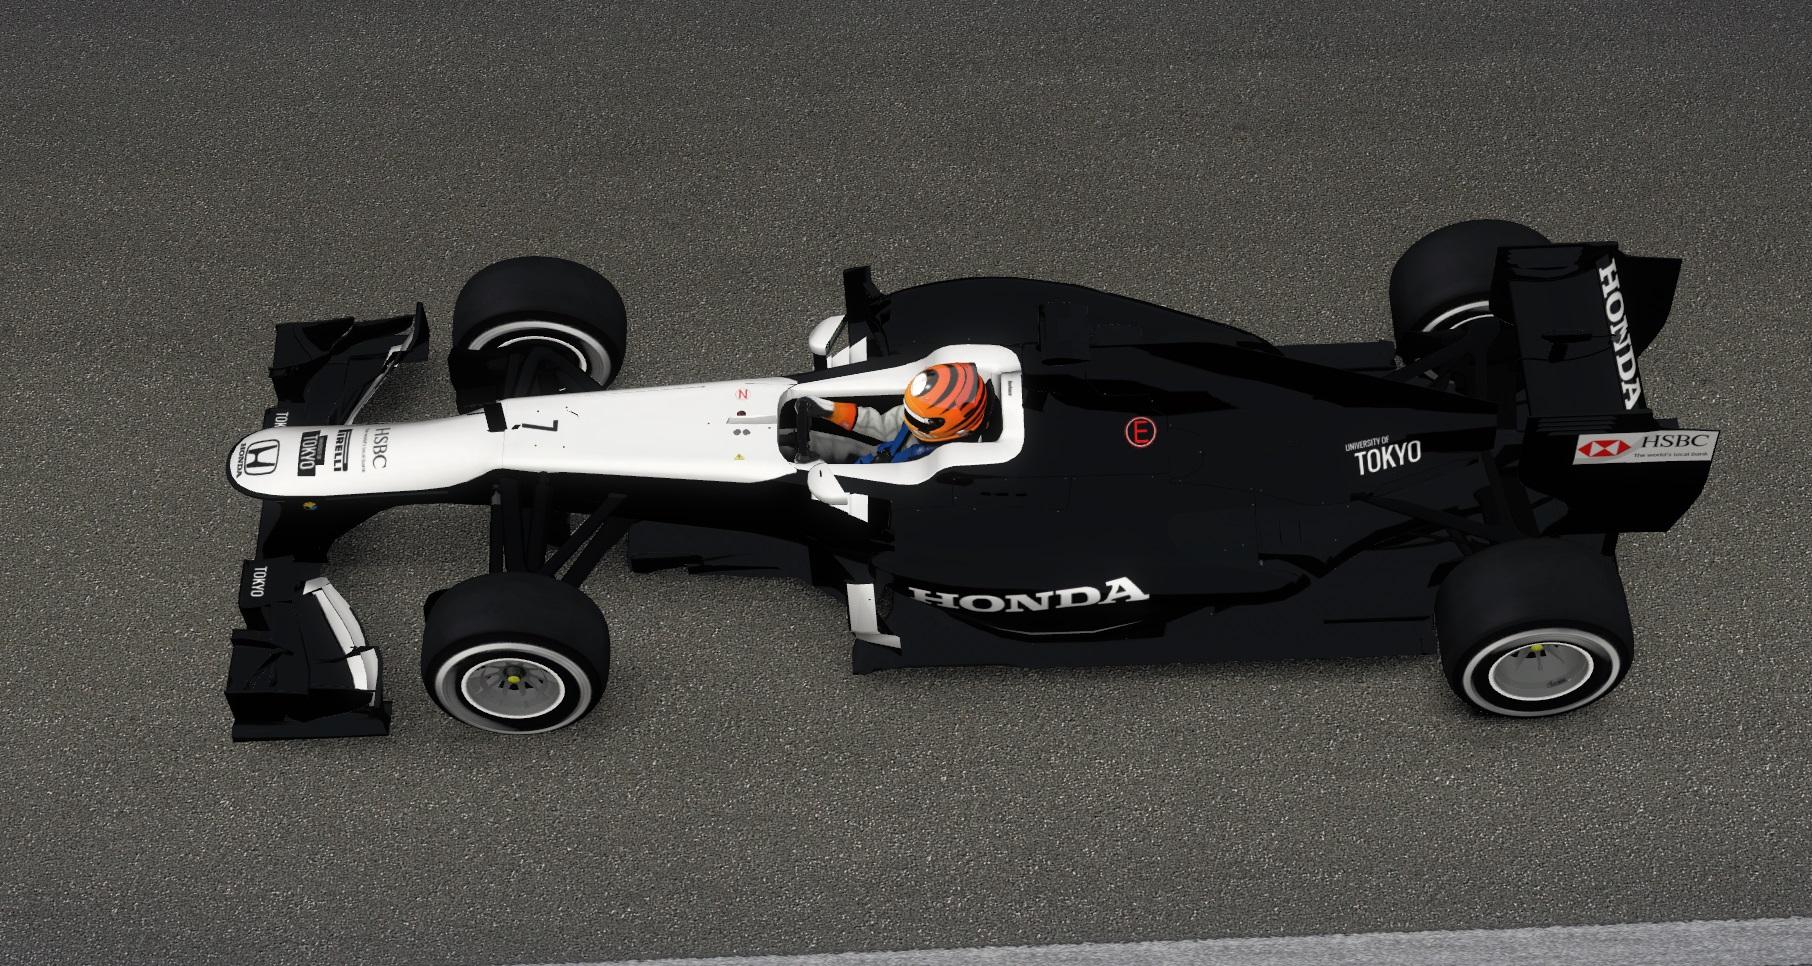 Honda Fx Promo Shot 2.jpg